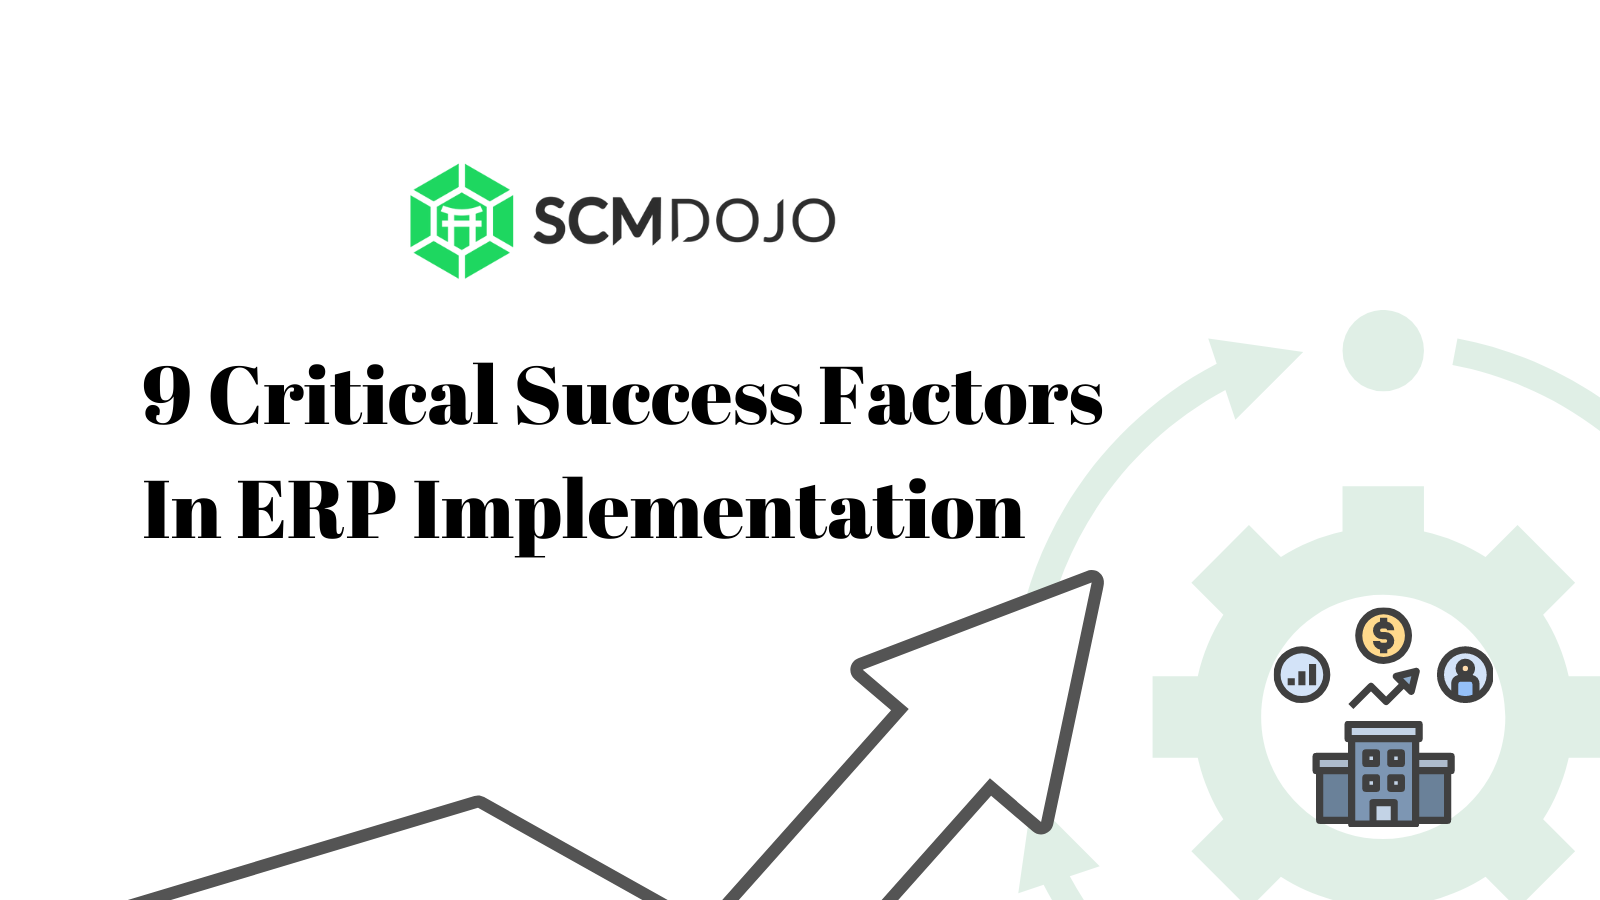 9 Critical Success Factors in ERP Implementation